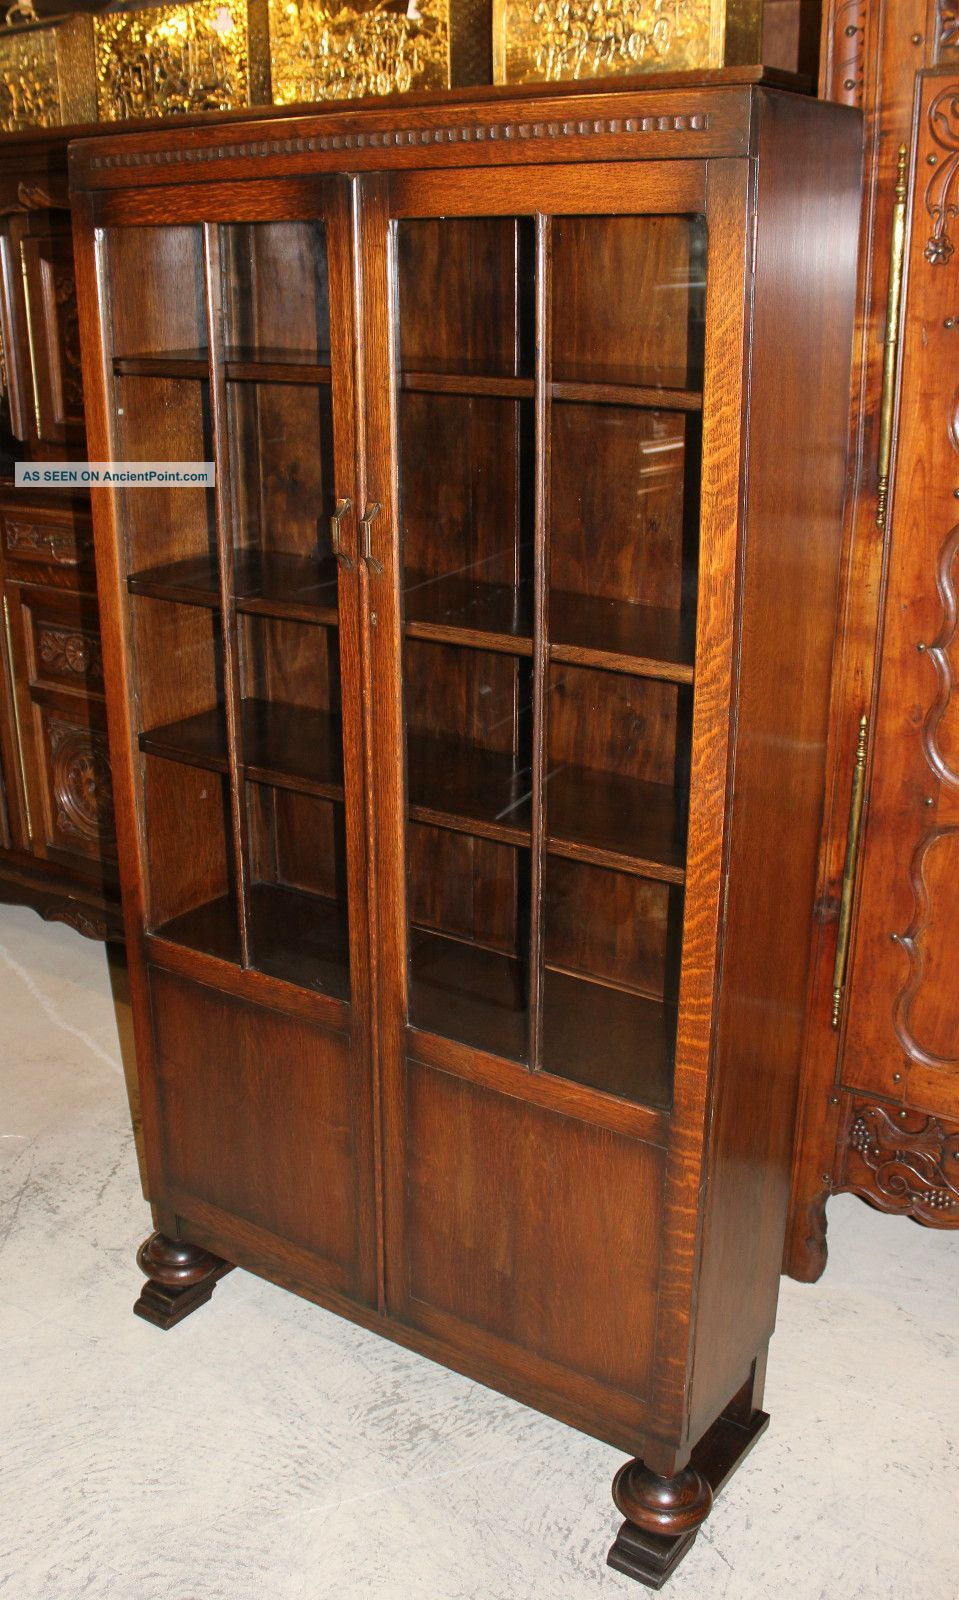 Splendid English Antique Art Deco Bookcase Cabinet Made From Oak